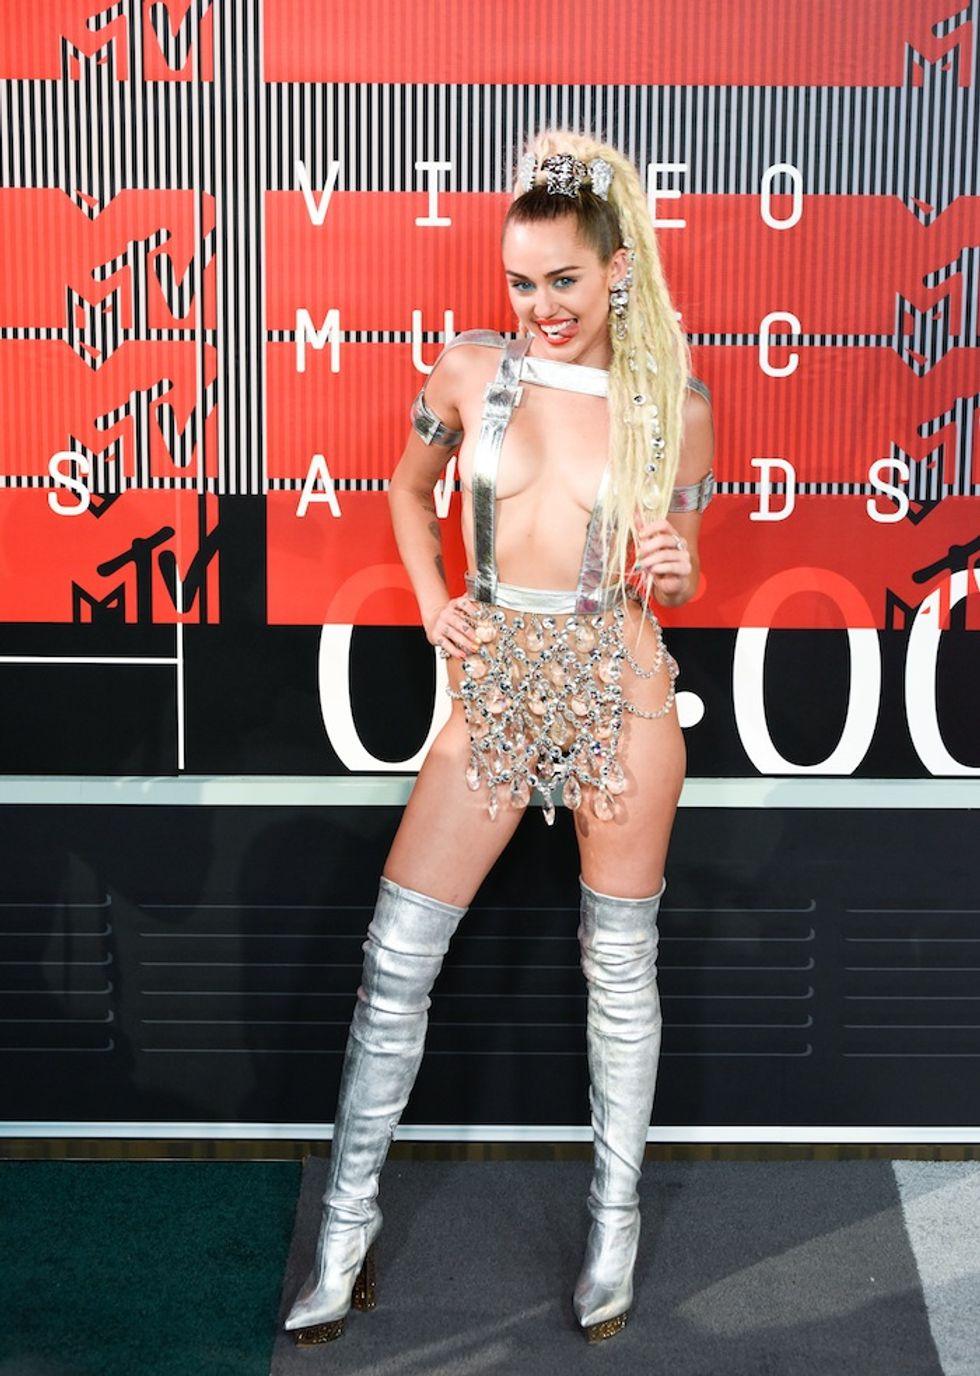 2015 VMAs Mark MTV's Comeback to Cool